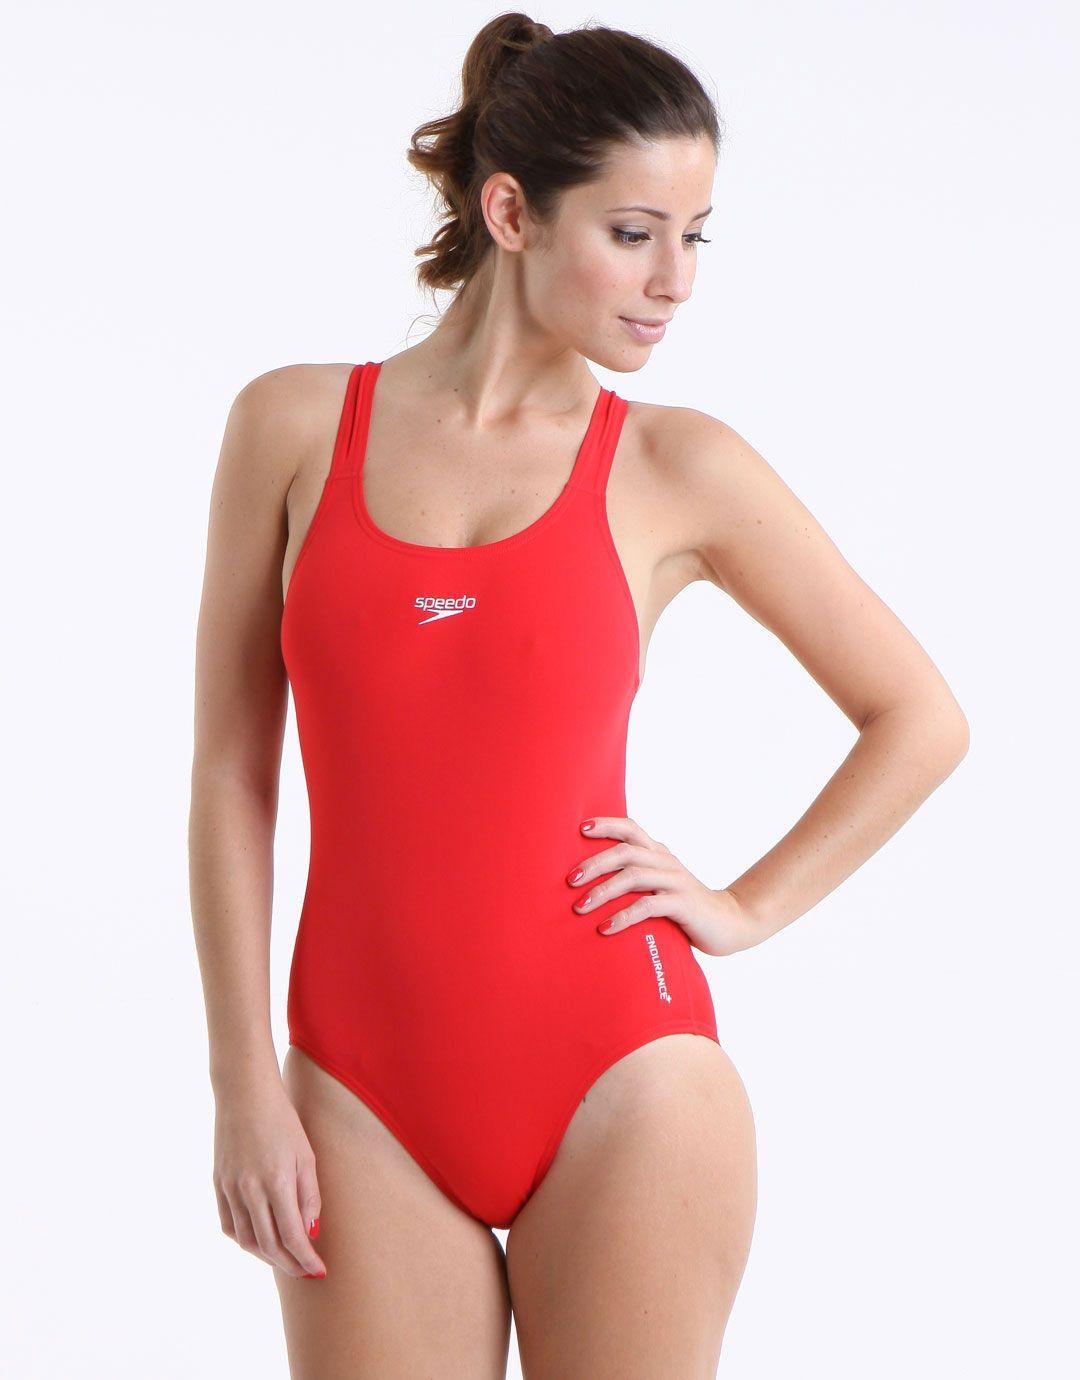 0bace88829 Endurance Plus Medalist - USA Red | 13 Sunken Years | Swimwear ...